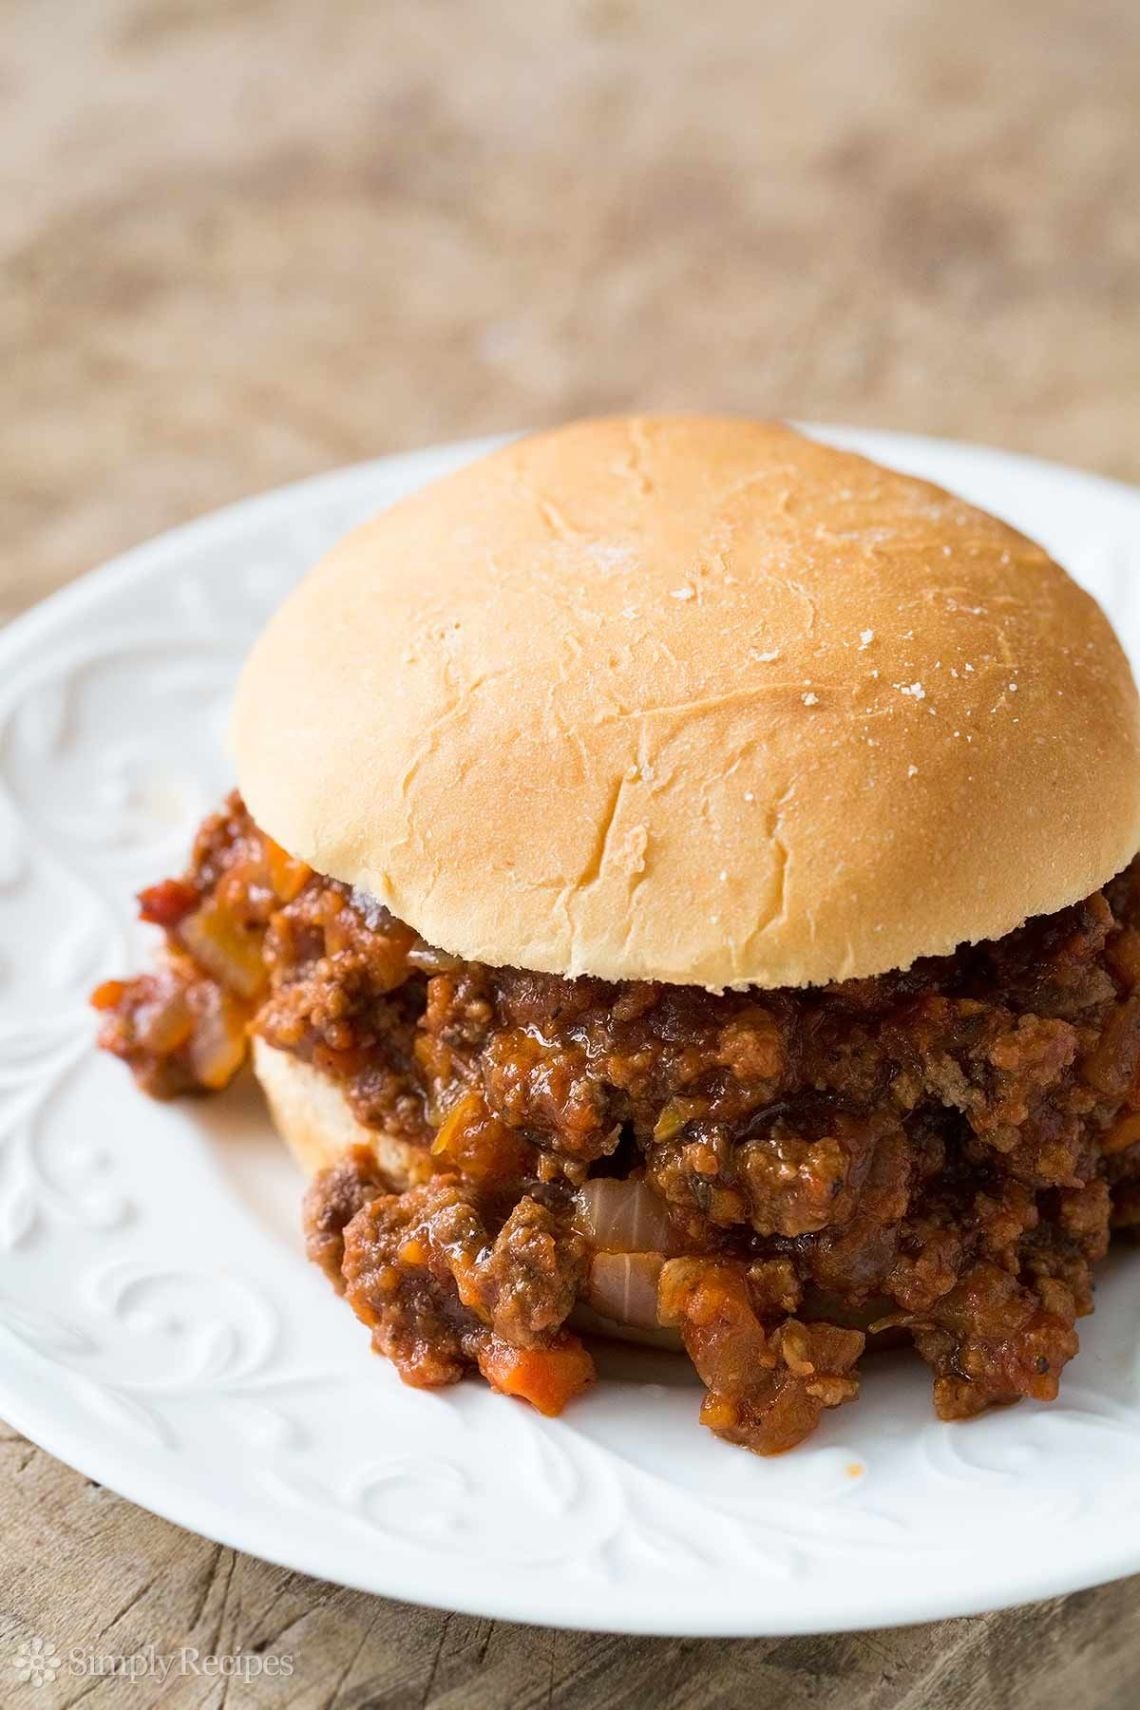 44 Best Ground Beef Recipes - Dinner Ideas With Ground Beef